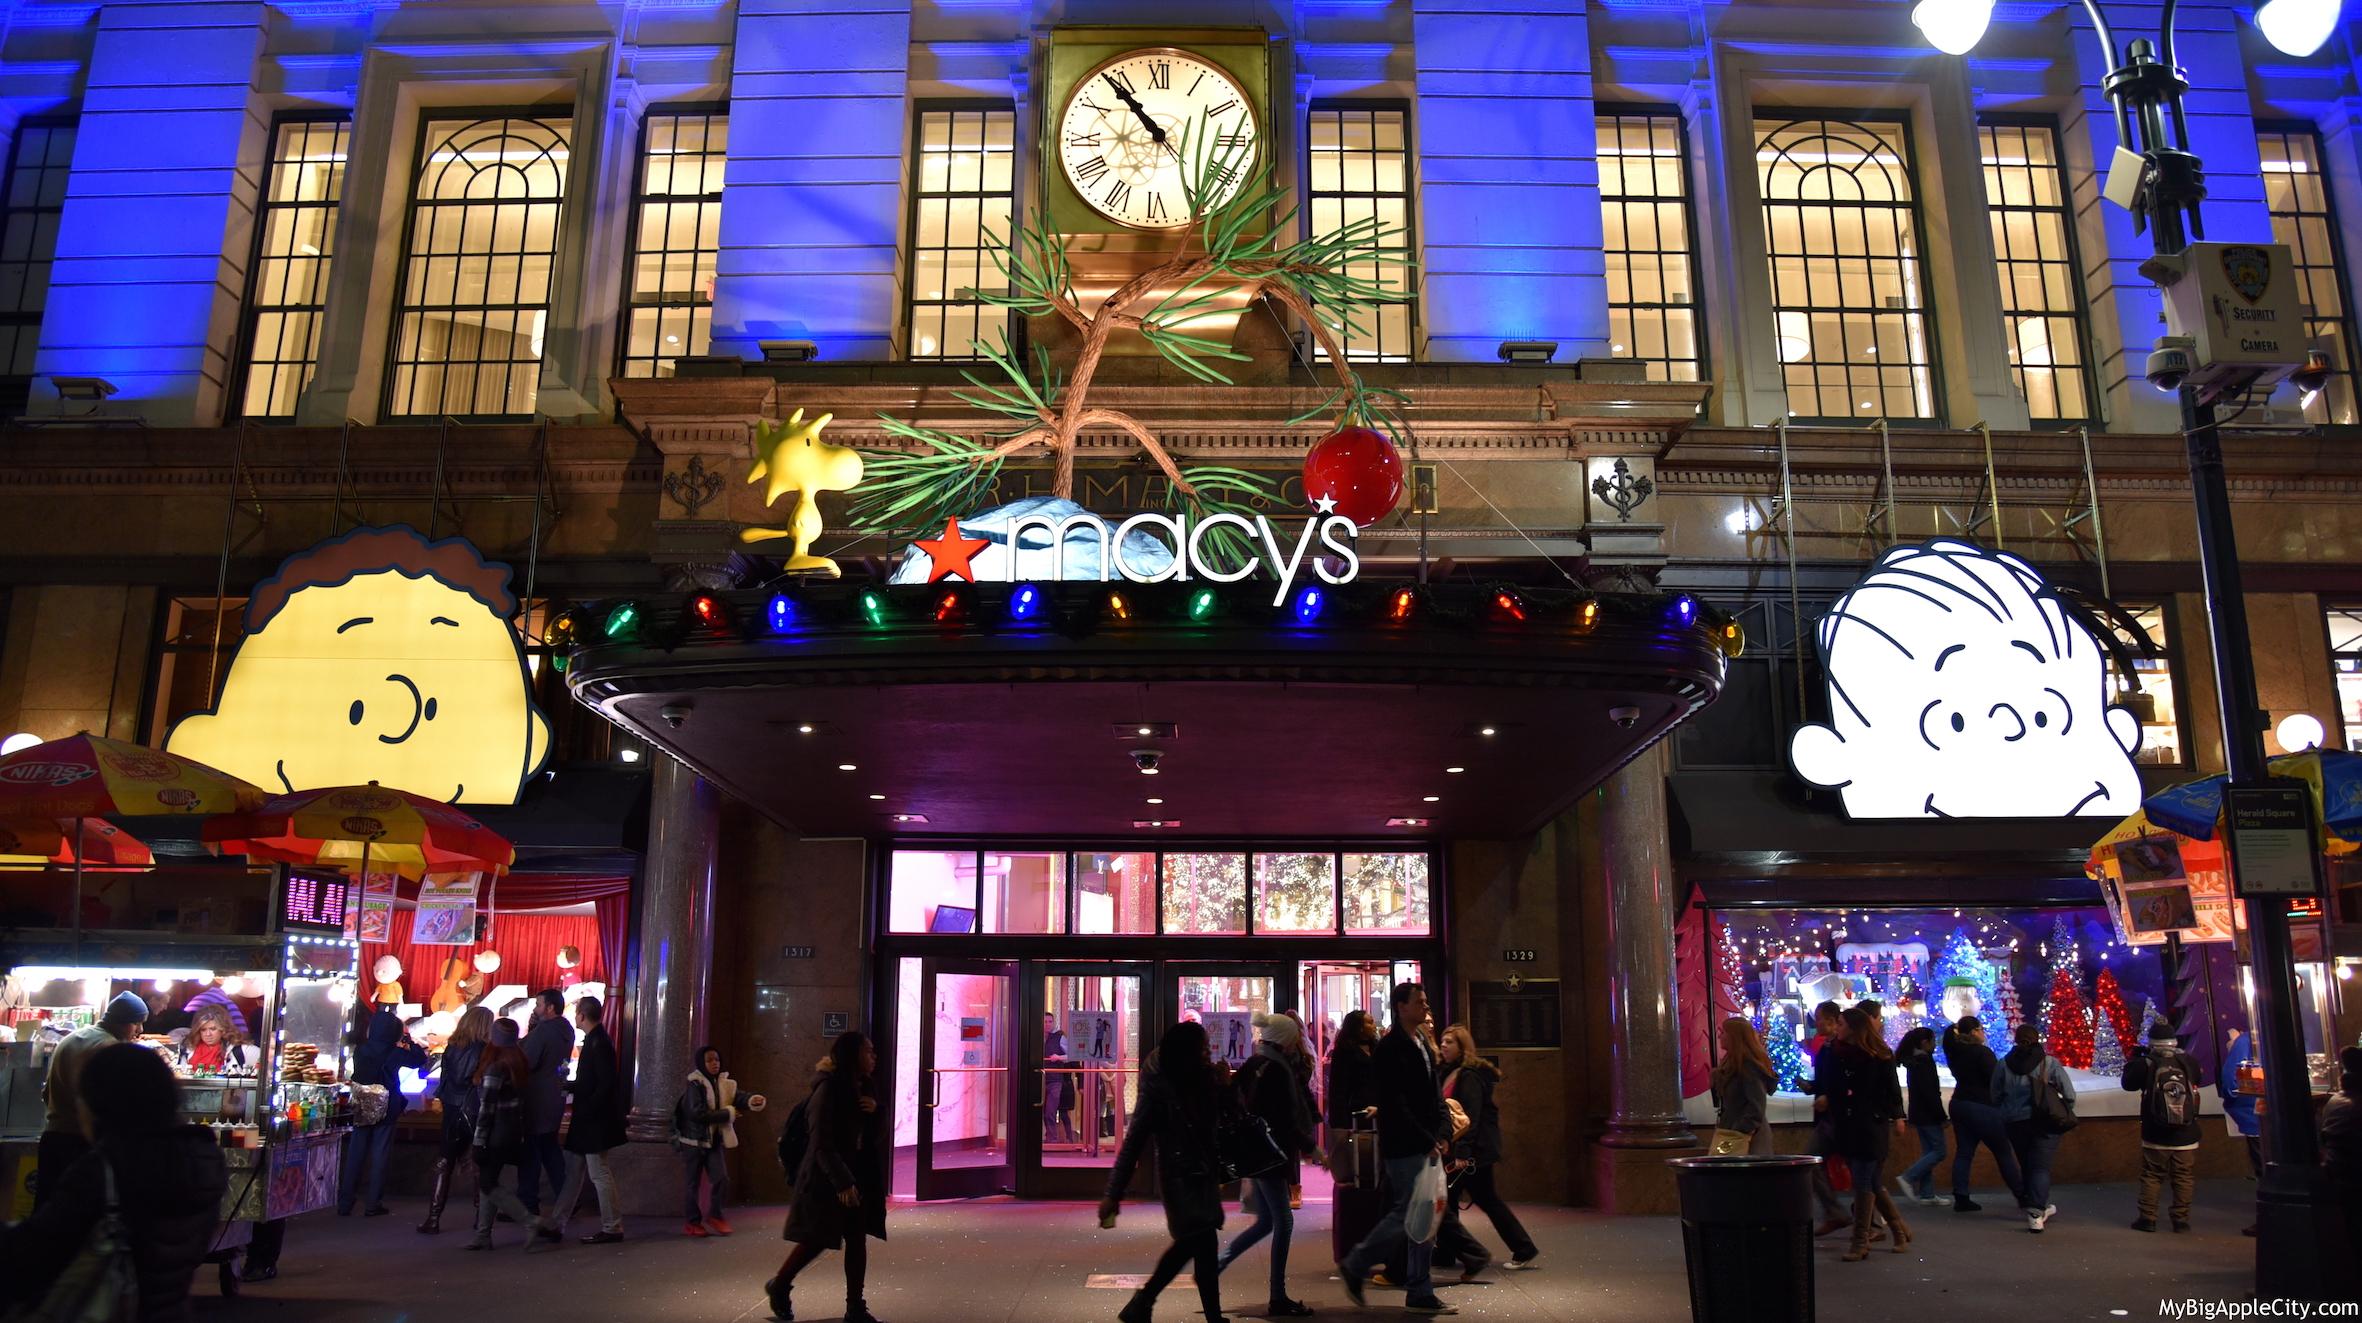 Macys-holiday-window-christmas-new-york-mybigapplecity